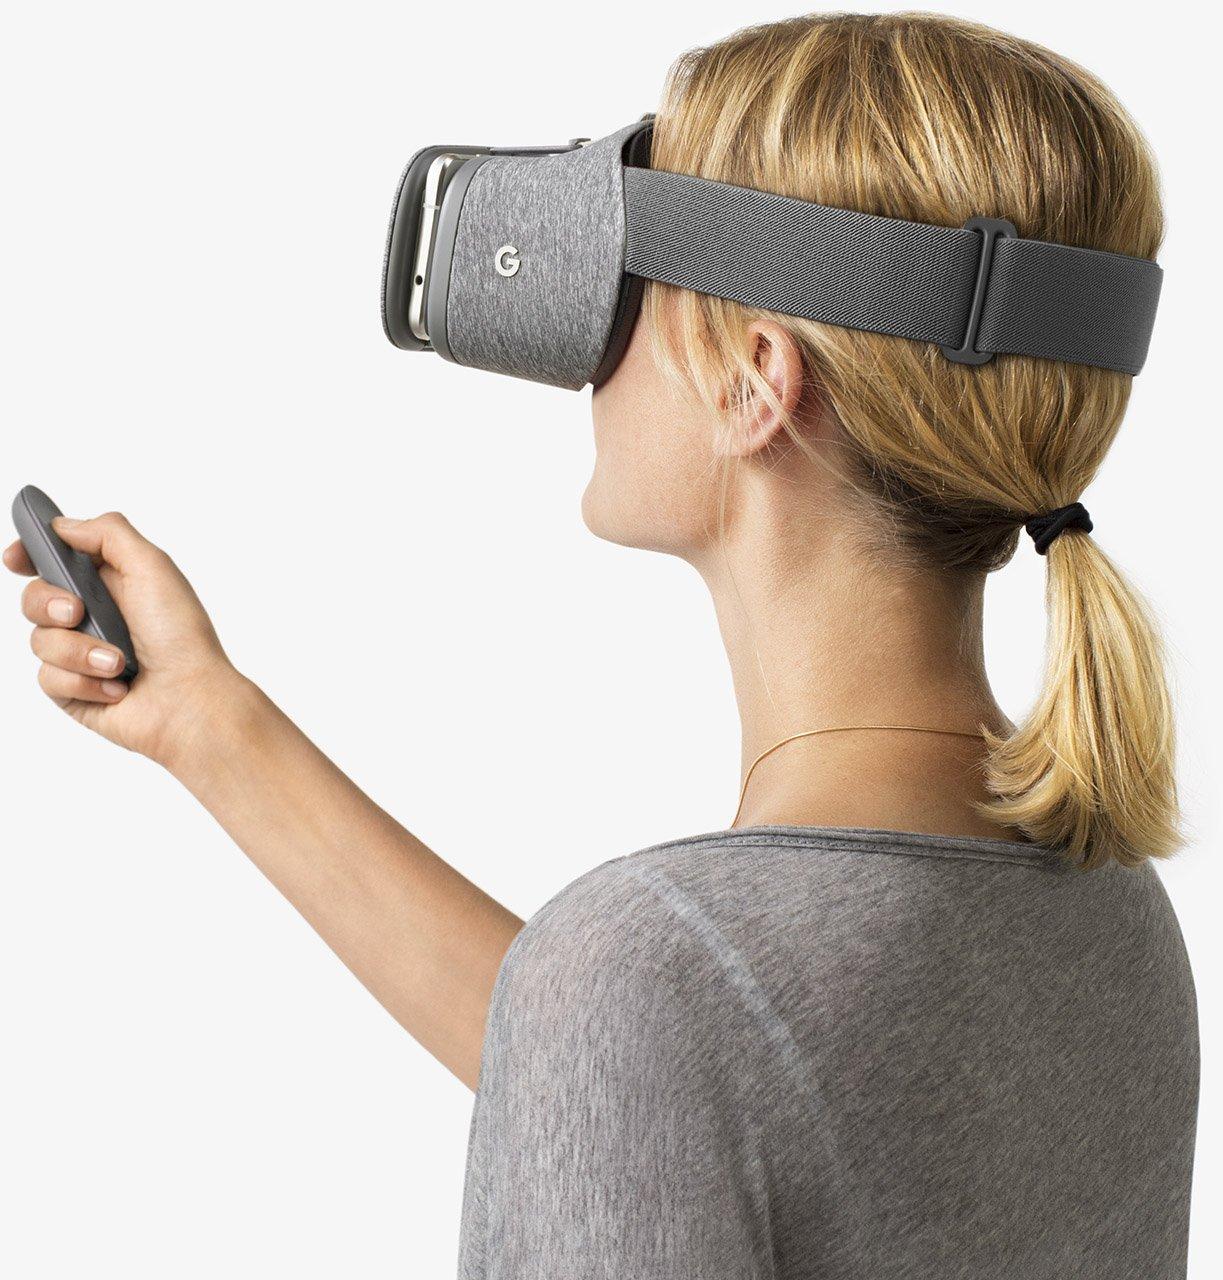 Google Daydream View - VR Headset